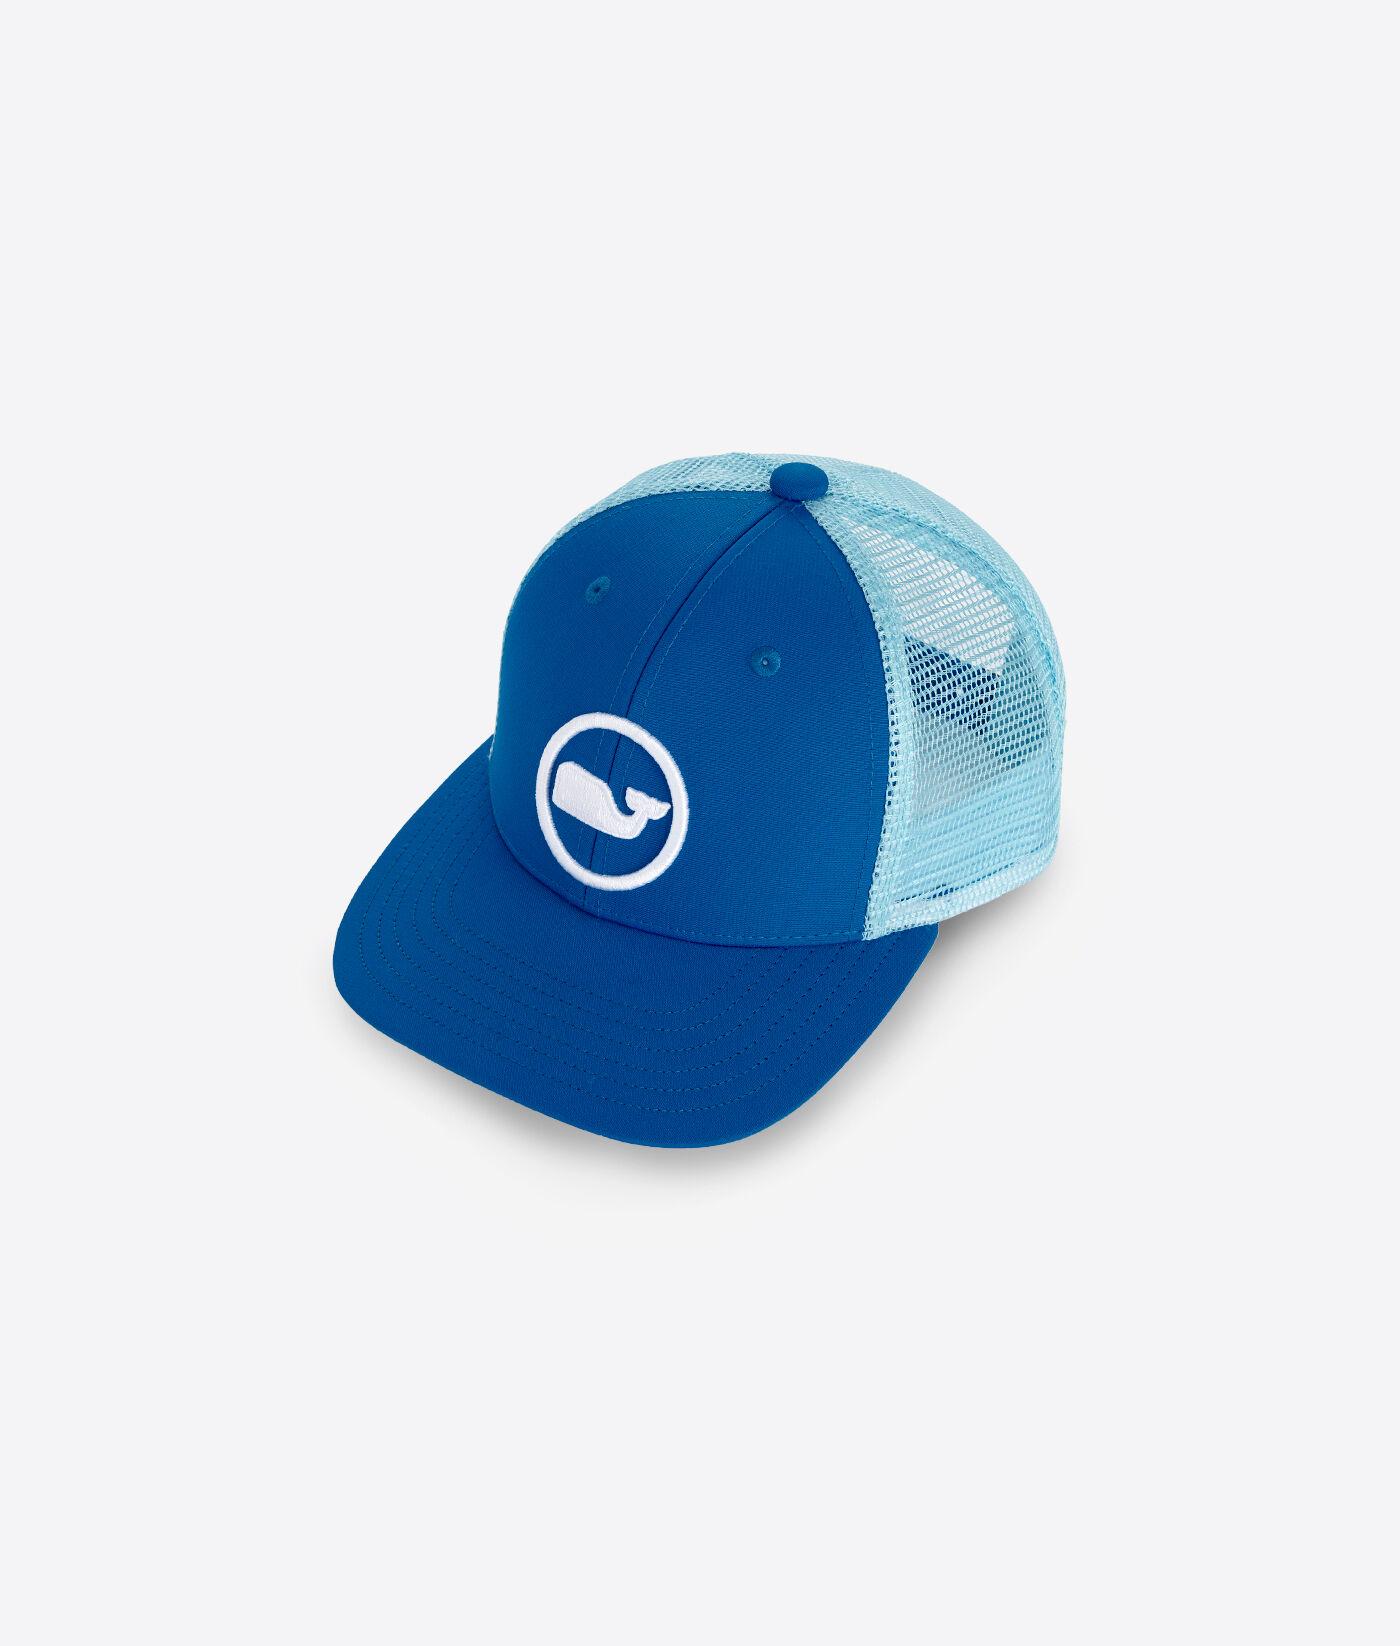 Vineyard Vines Mens Whale Dot Trucker Hat Adjustable Snapback Mesh A